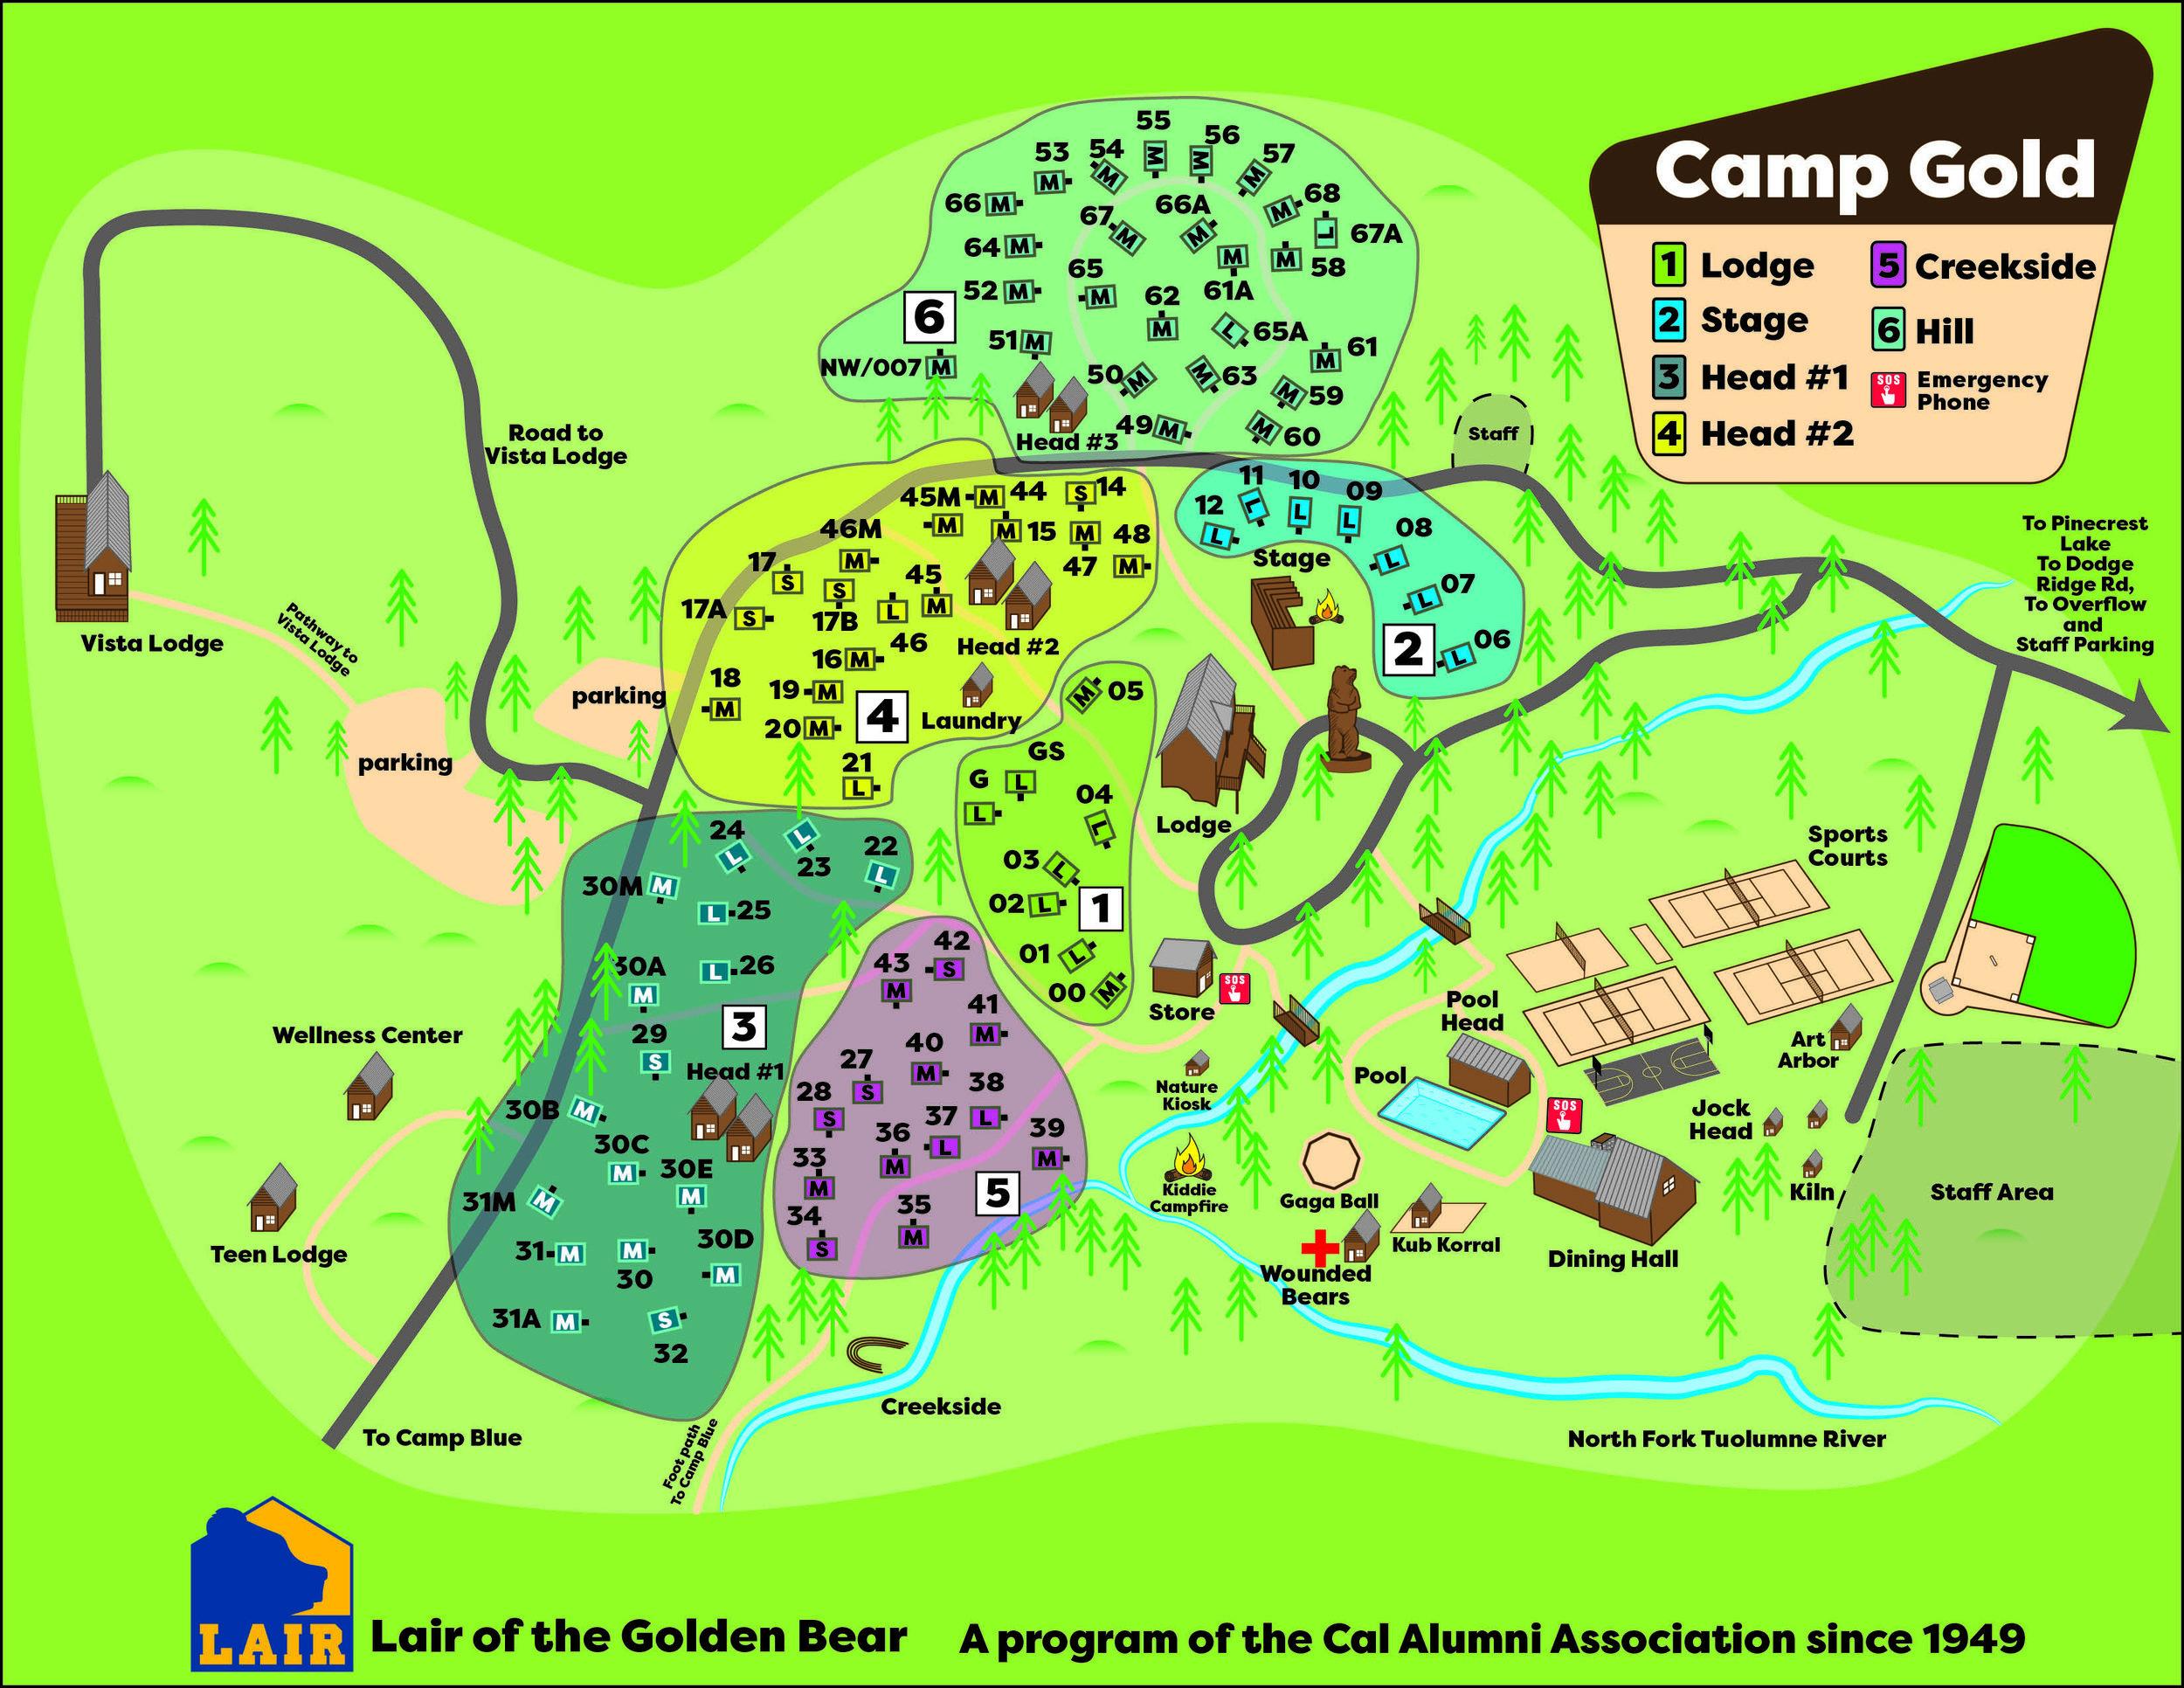 2018 Camp Gold Map_0.jpg